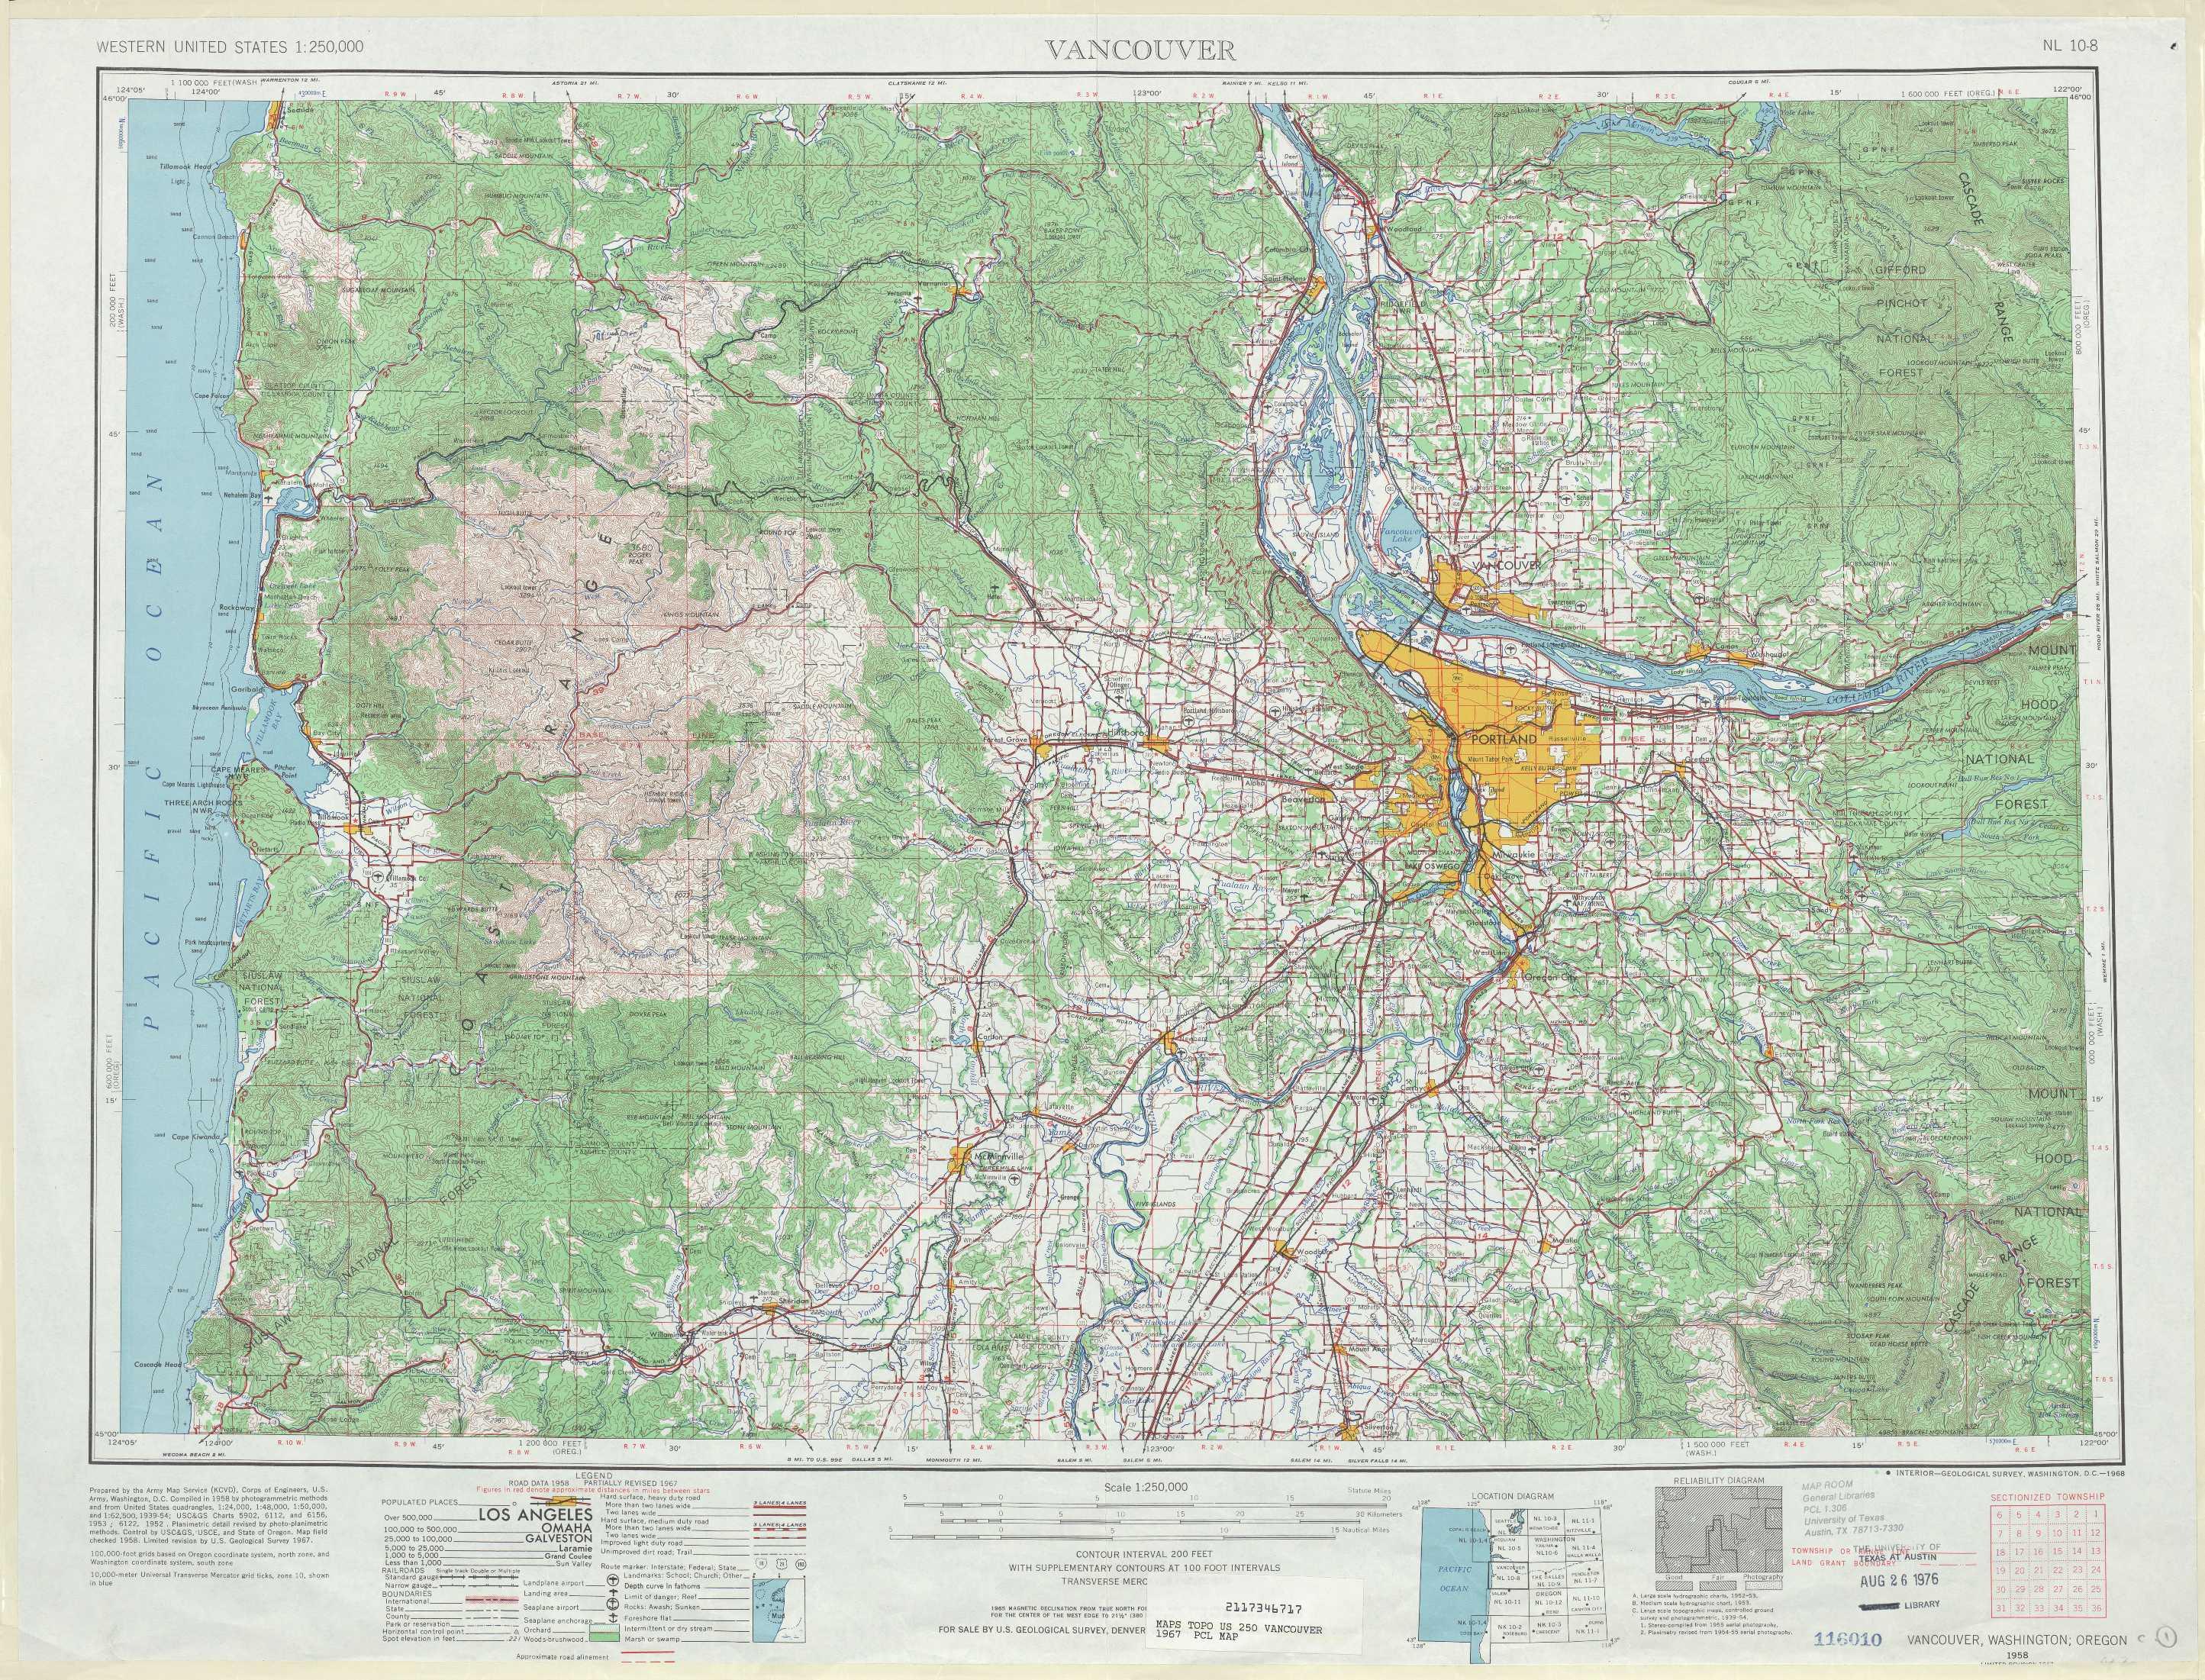 Vancouver Topographic Maps Or Wa Usgs Topo Quad 45122a1 At 1